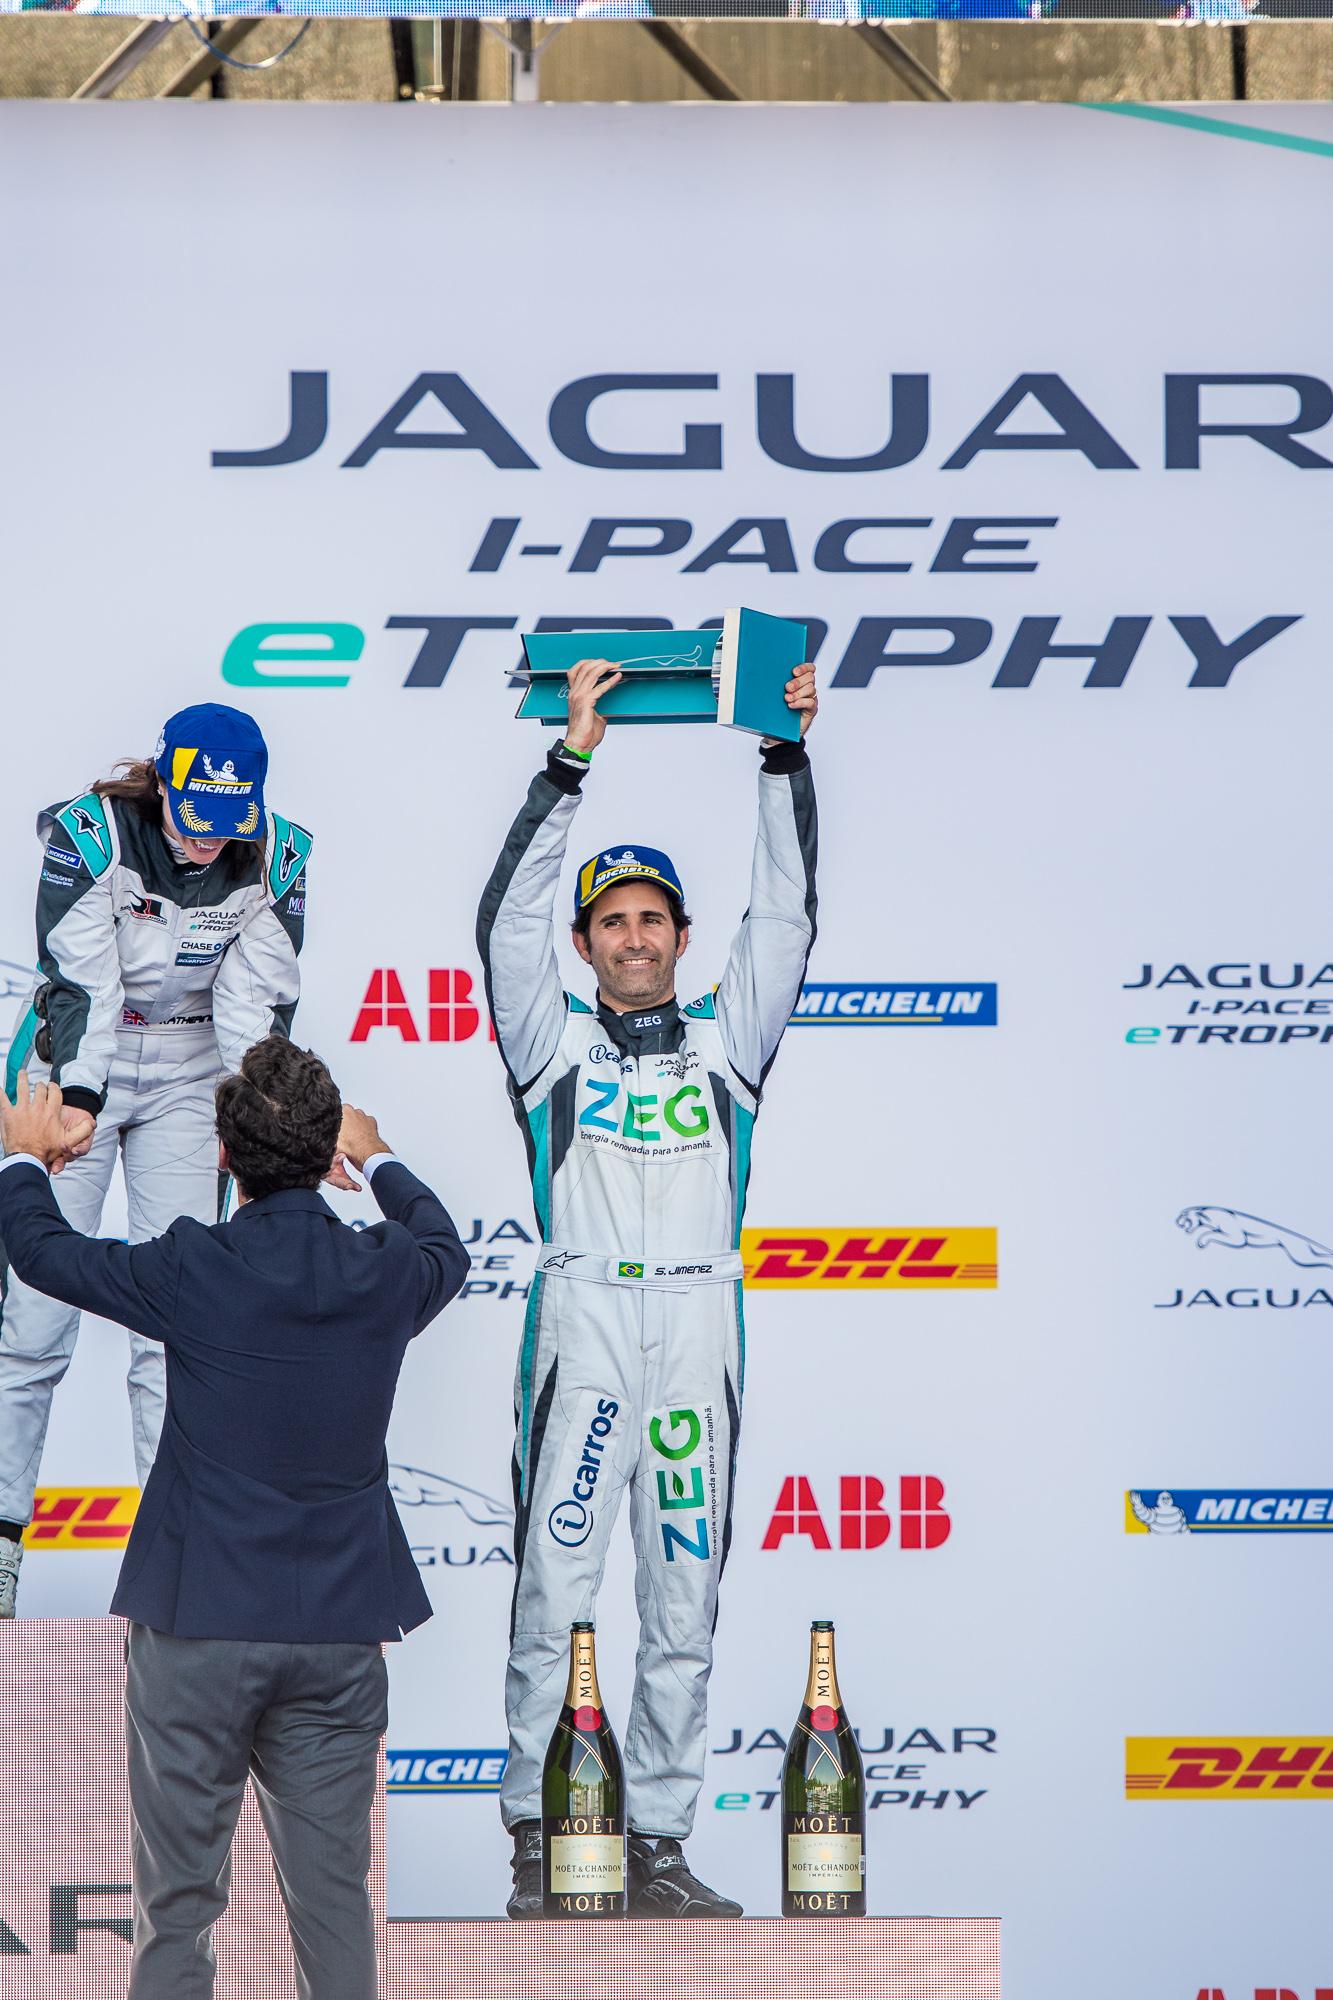 JaguarBR_4.Mexico_josemariodias_09030